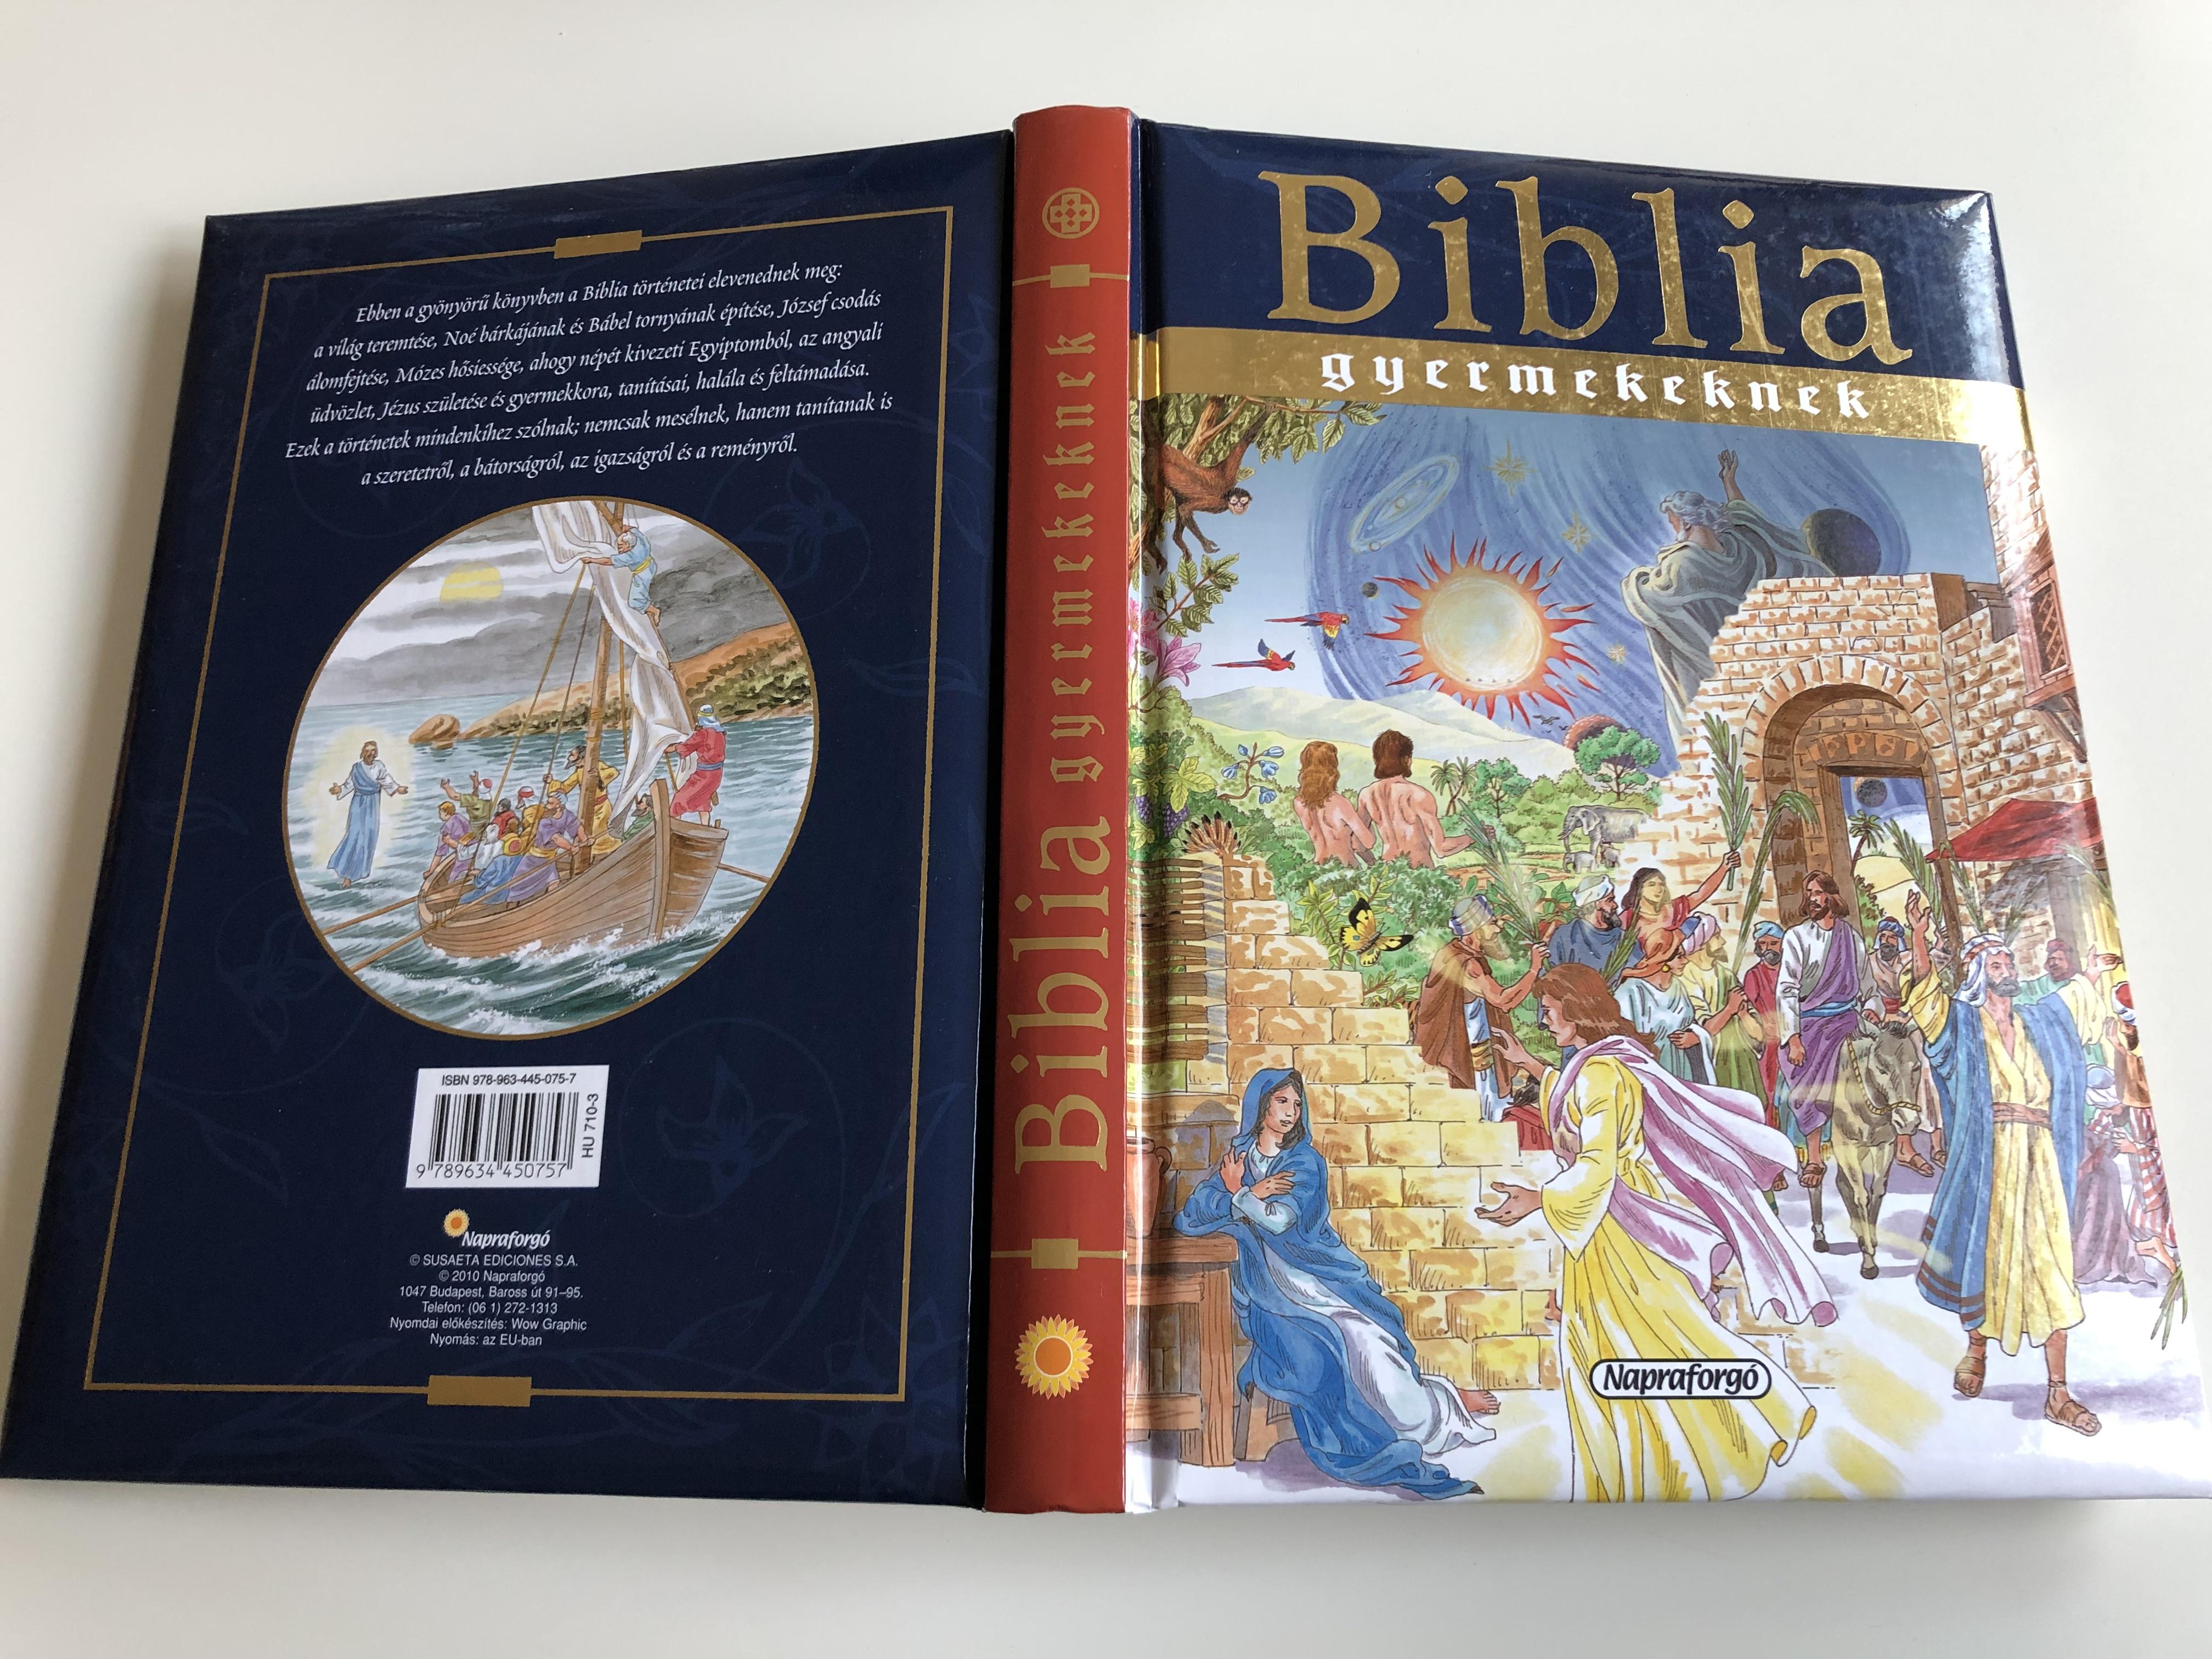 biblia-gyermekeknek-hungarian-bible-for-children-editor-campos-jim-nez-m-ria-hardcover-2010-napraforg-kiad-11-.jpg